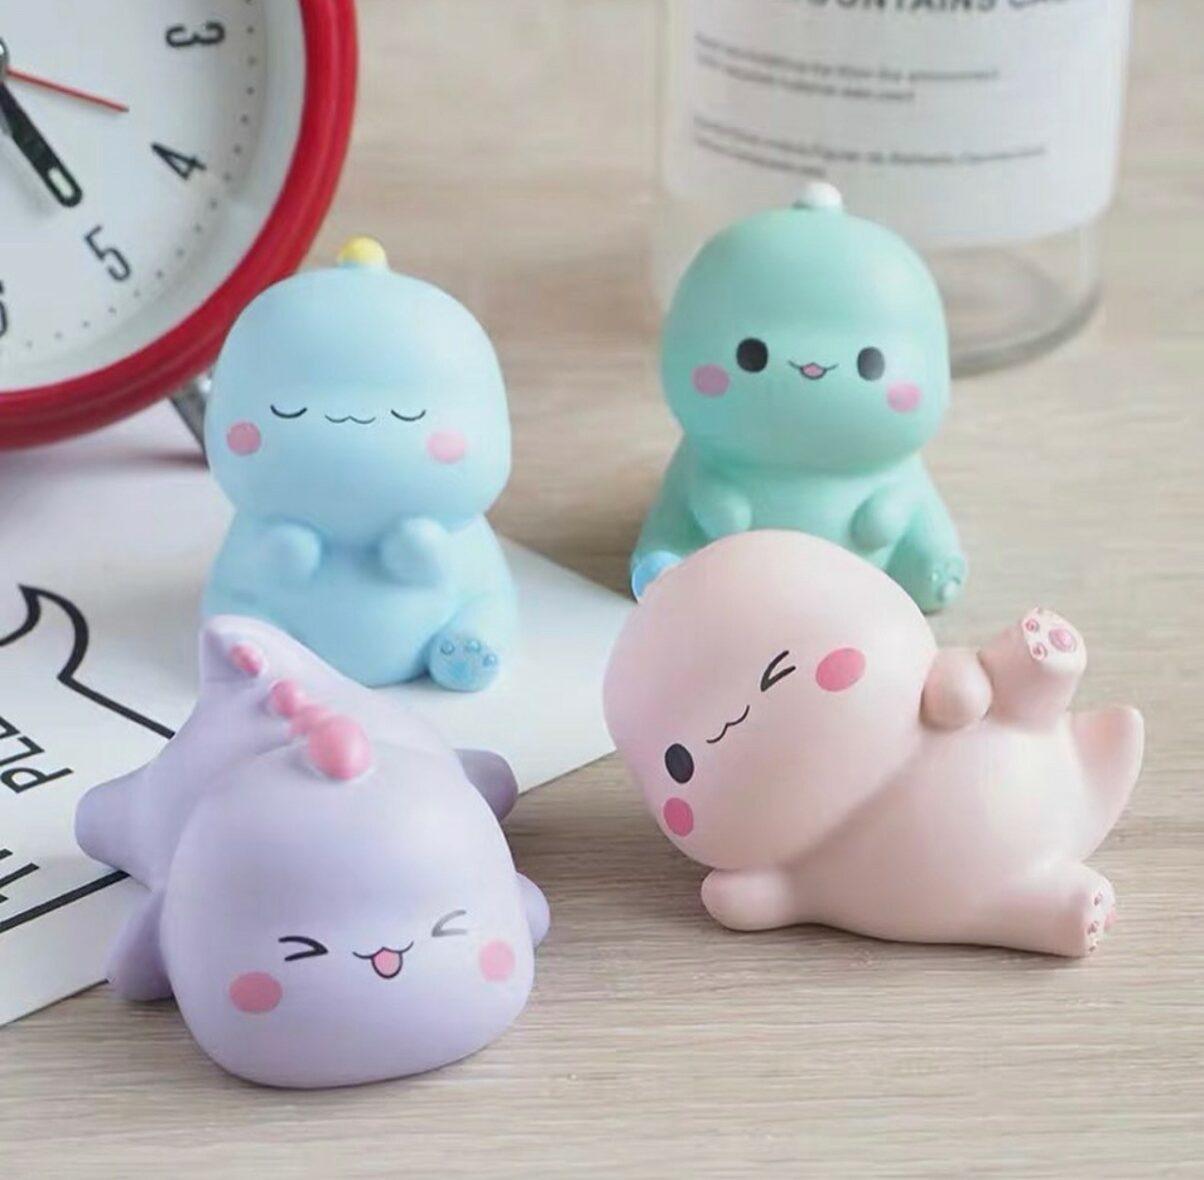 Kawaii Mini Dinosaur Dolls – Limited Edition